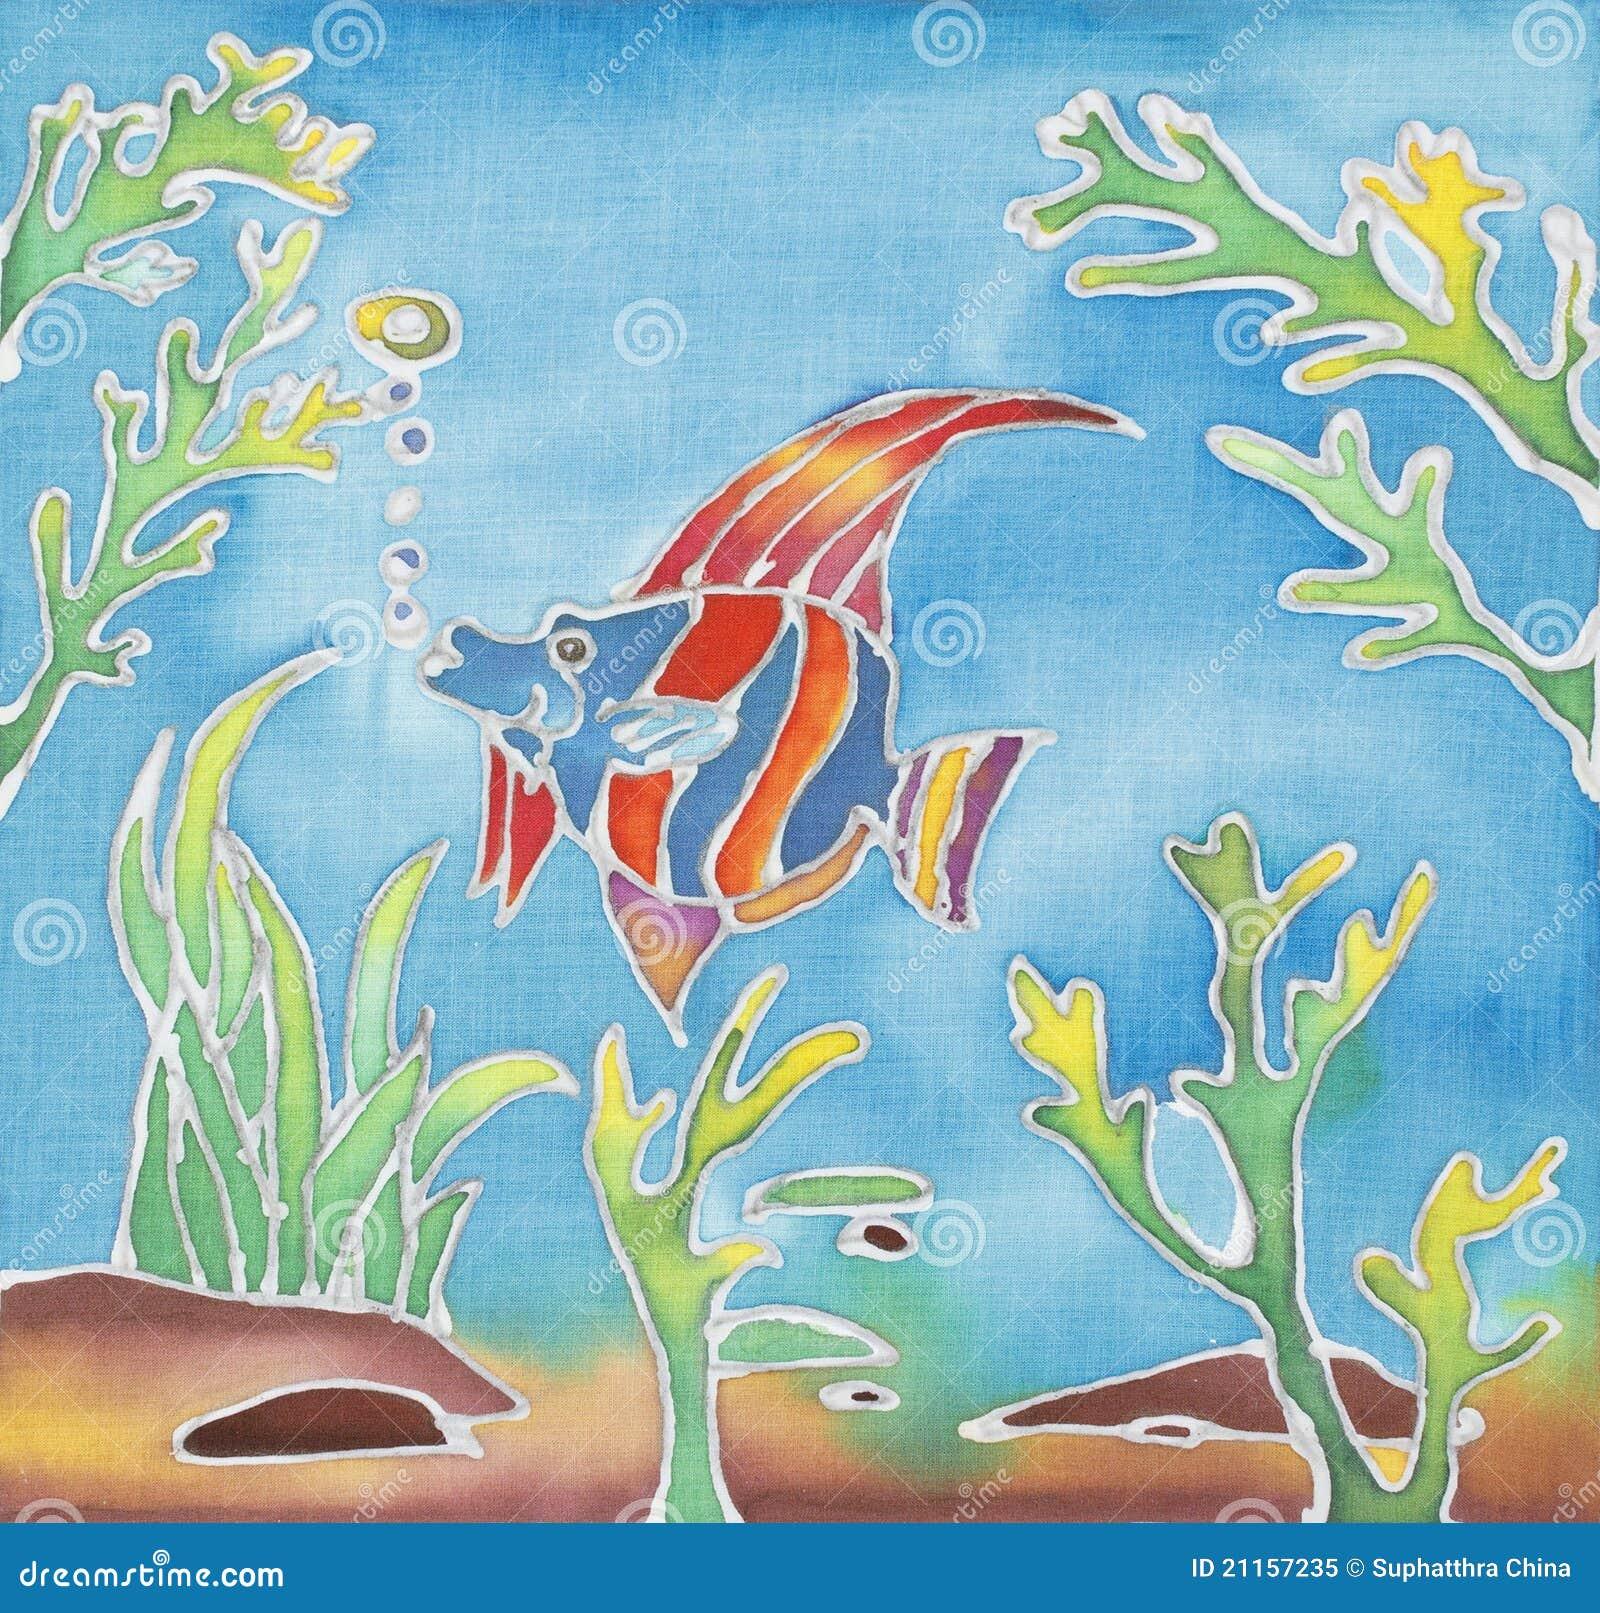 Batik Design Stock Image. Image Of Textile, Backgrounds